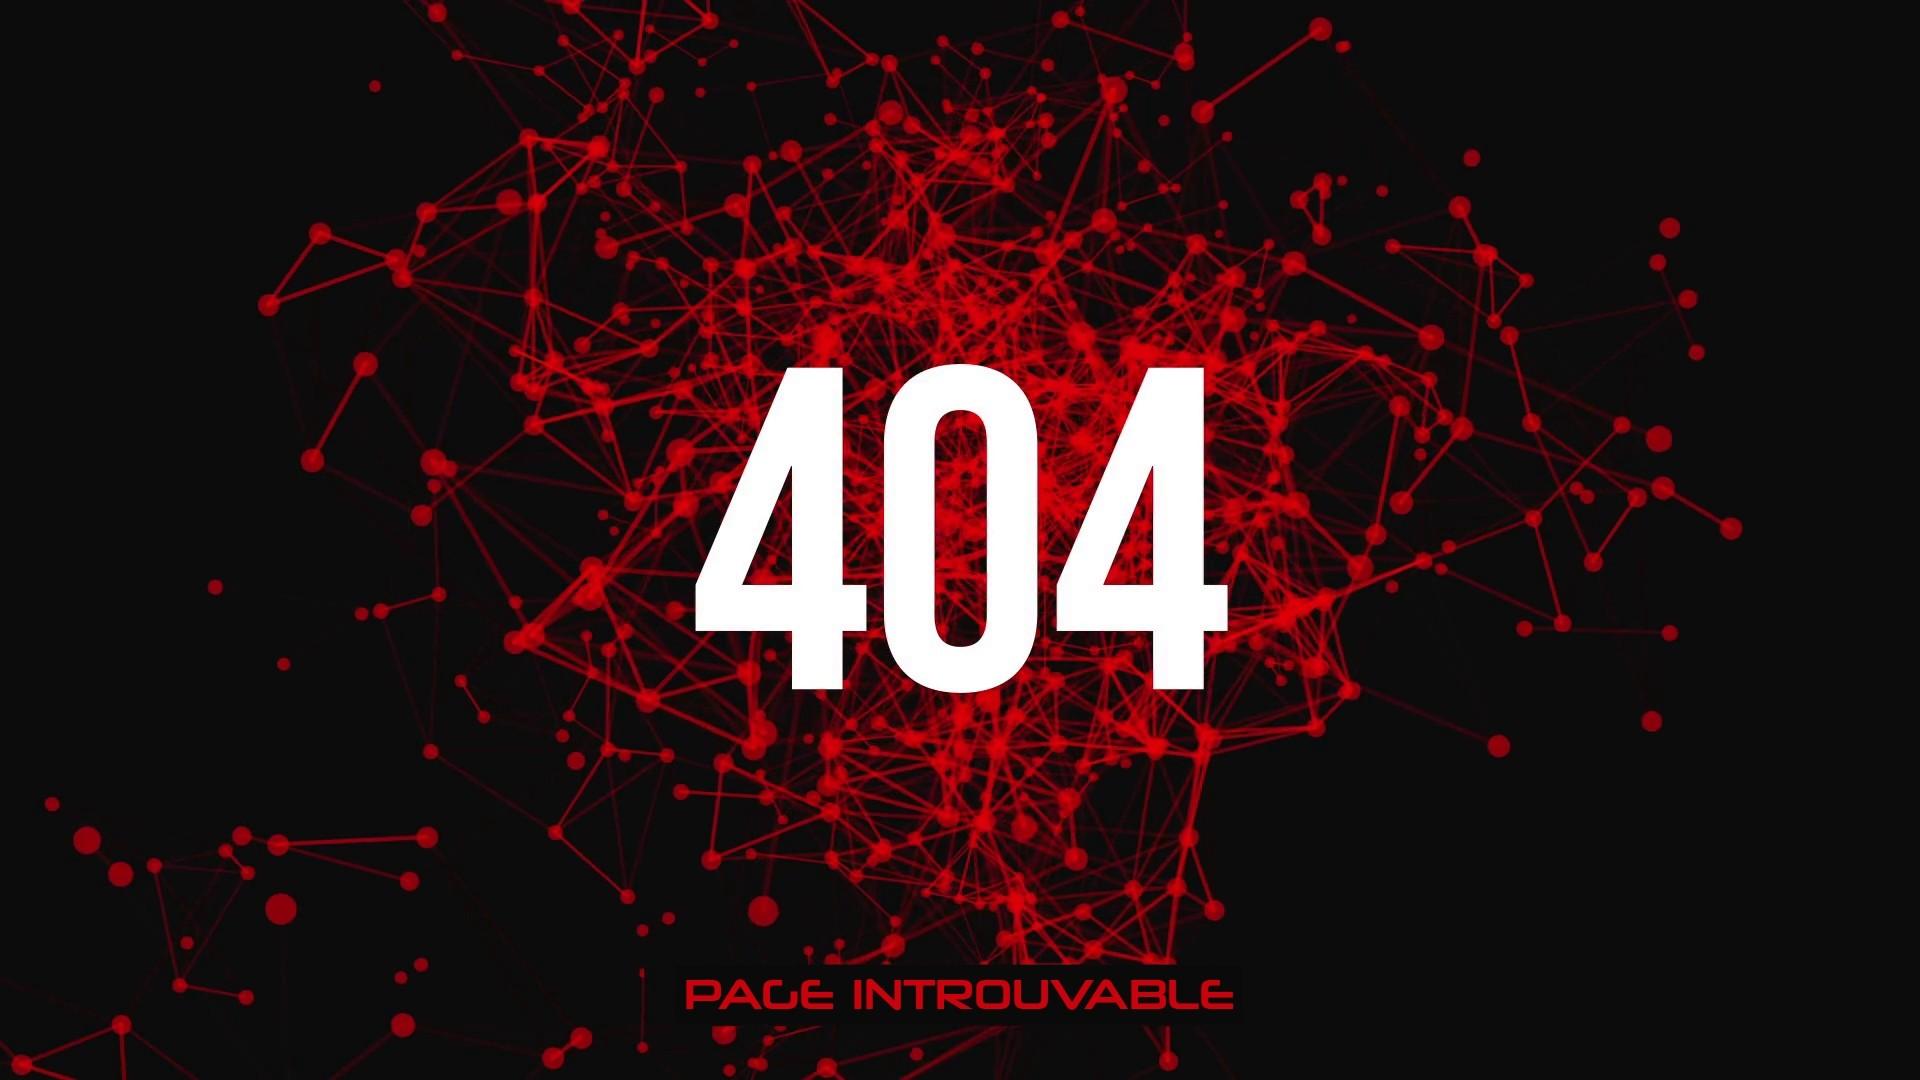 Error 404 hd wallpaper download